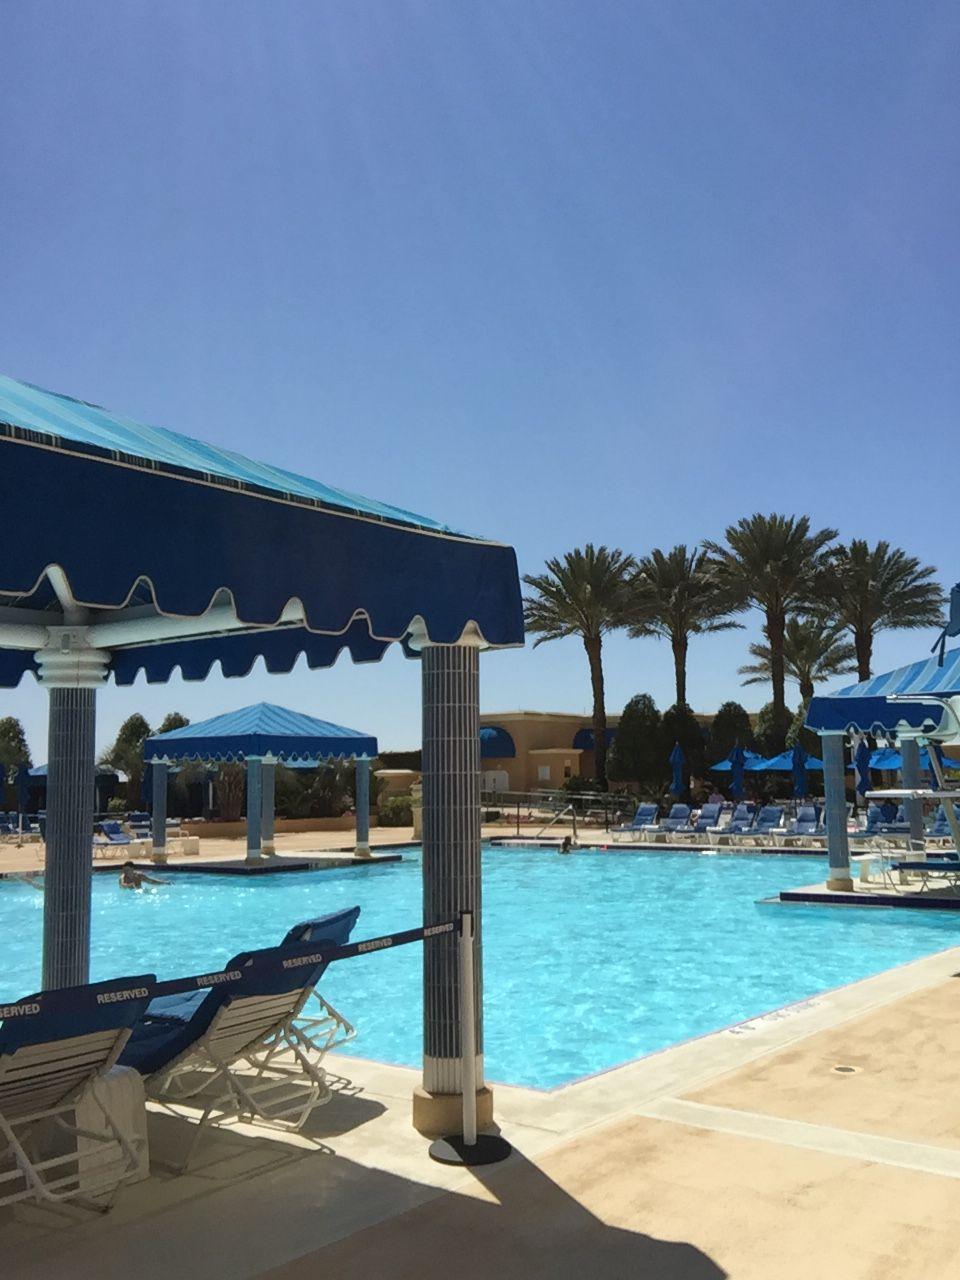 Beau Rivage Resort Casino Pool Area Biloxi Mississippi Pool